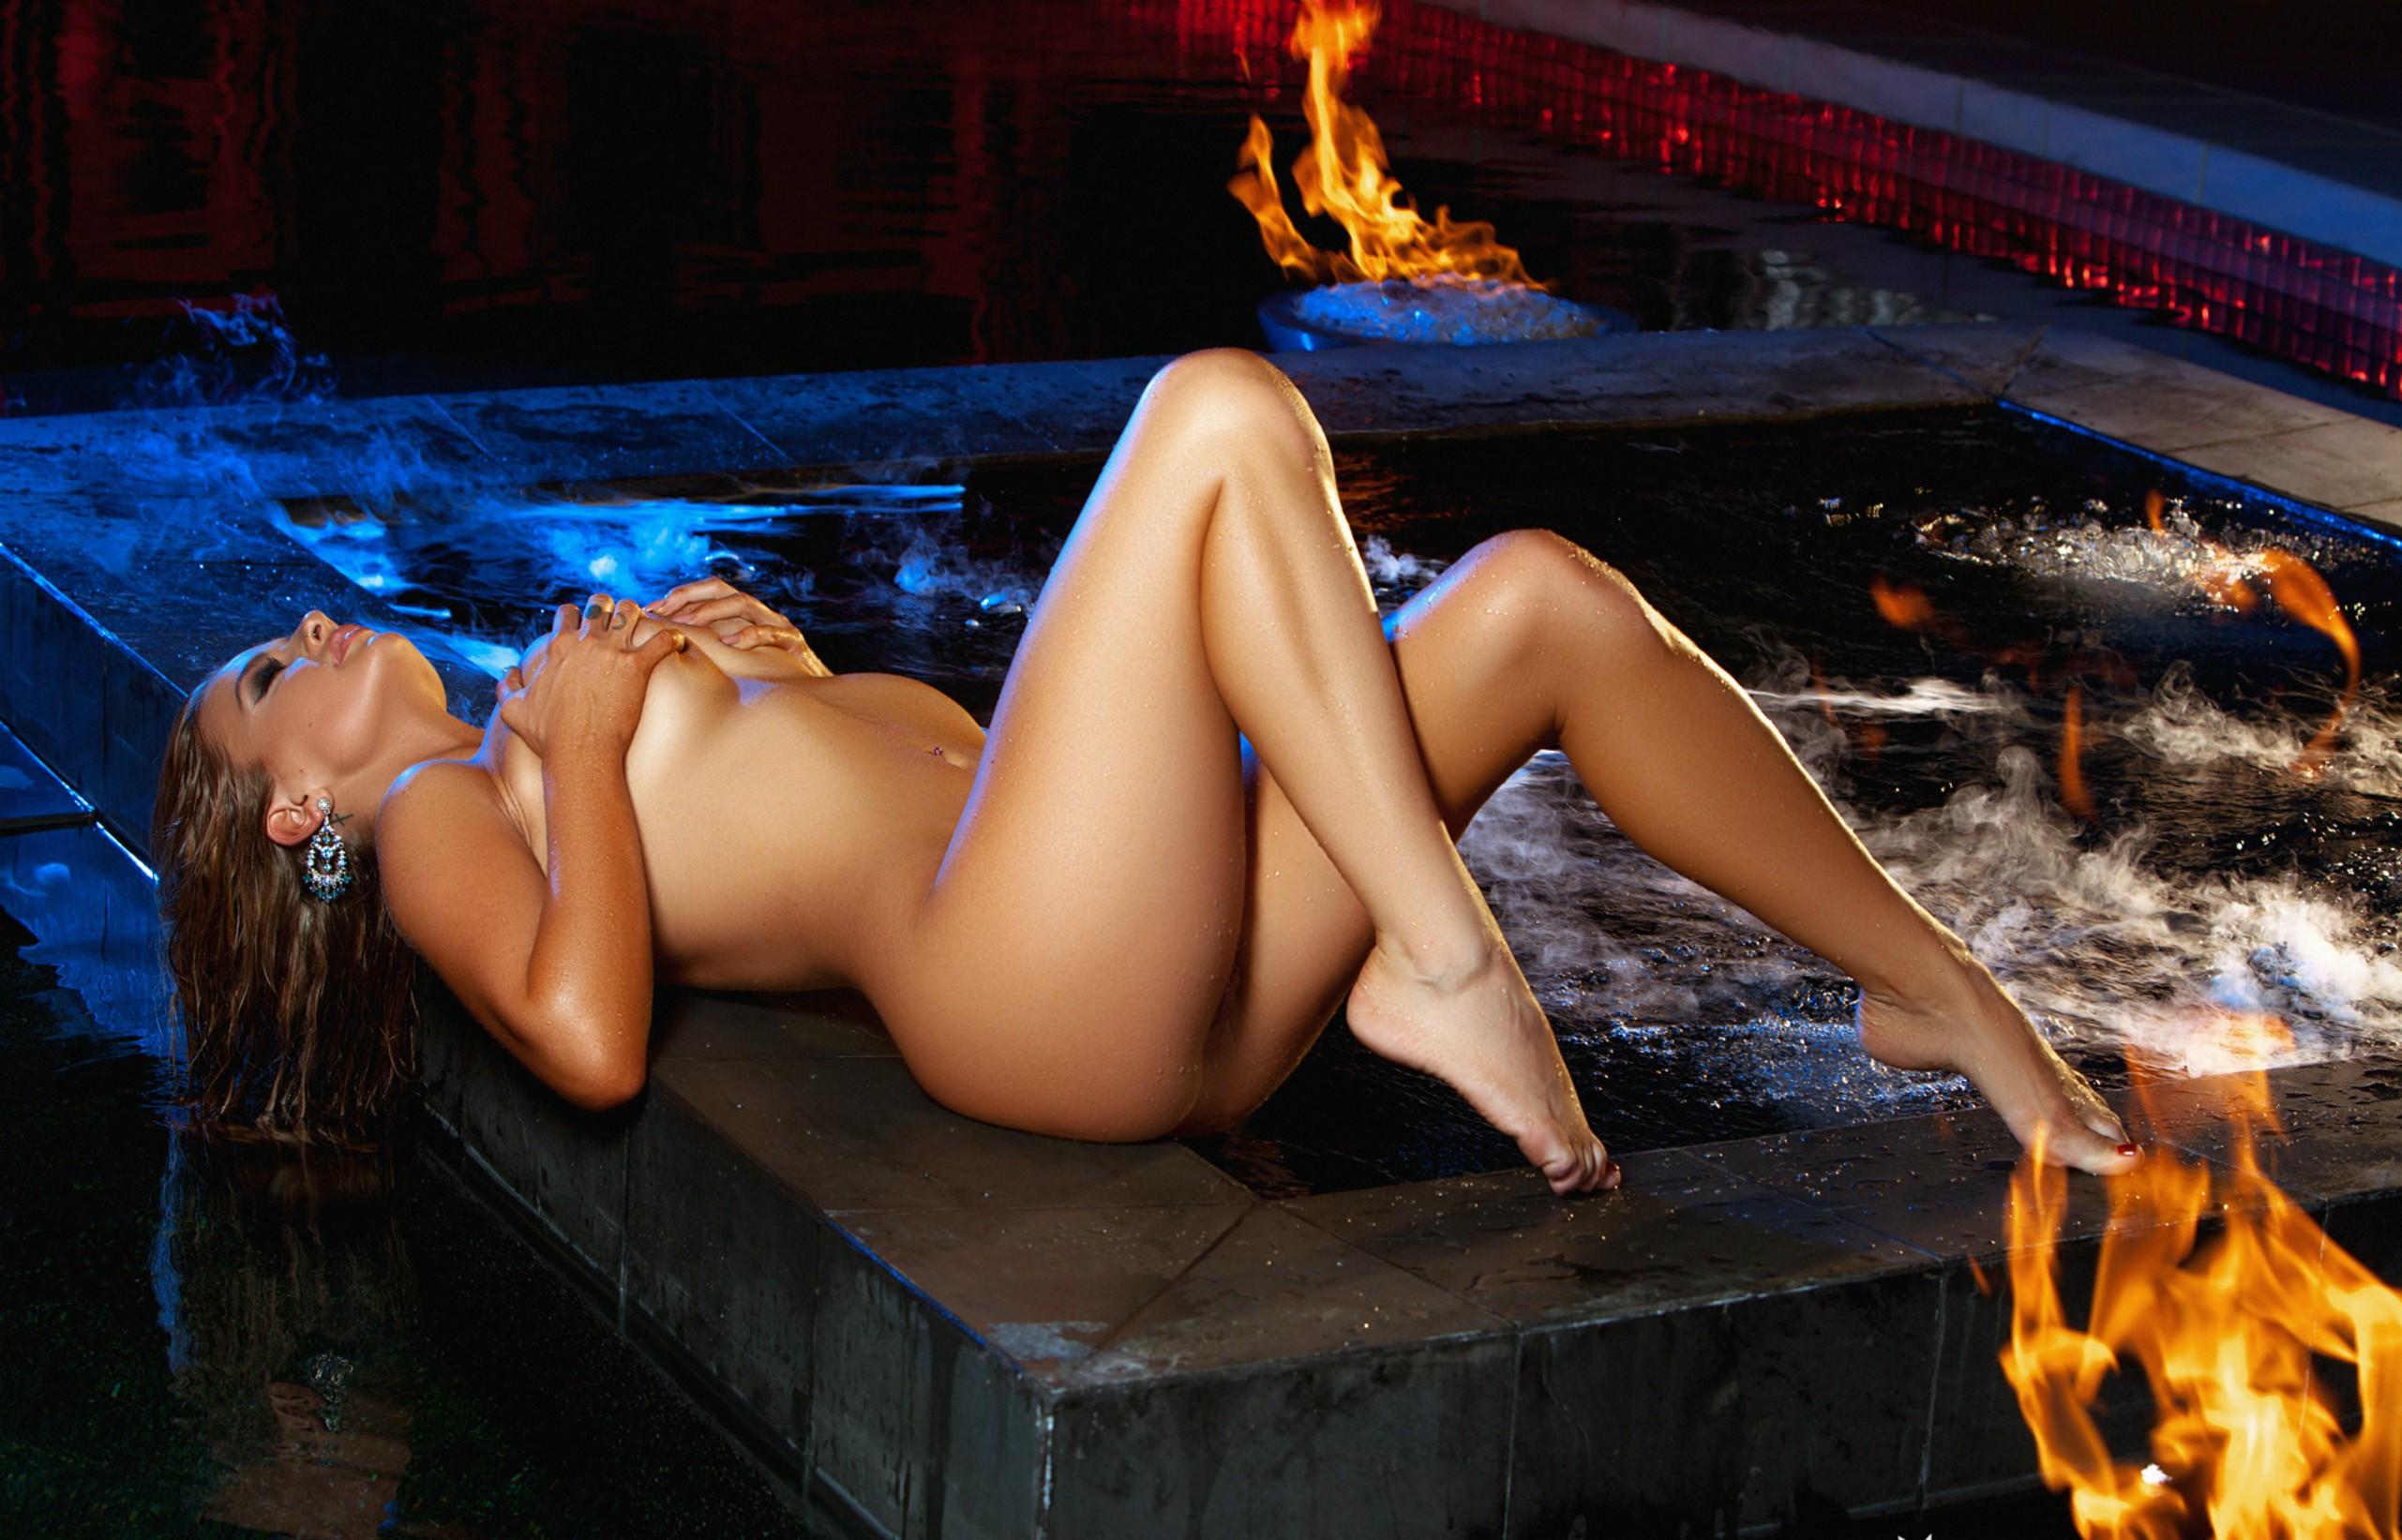 playboy-cybergirls-nude-oiled